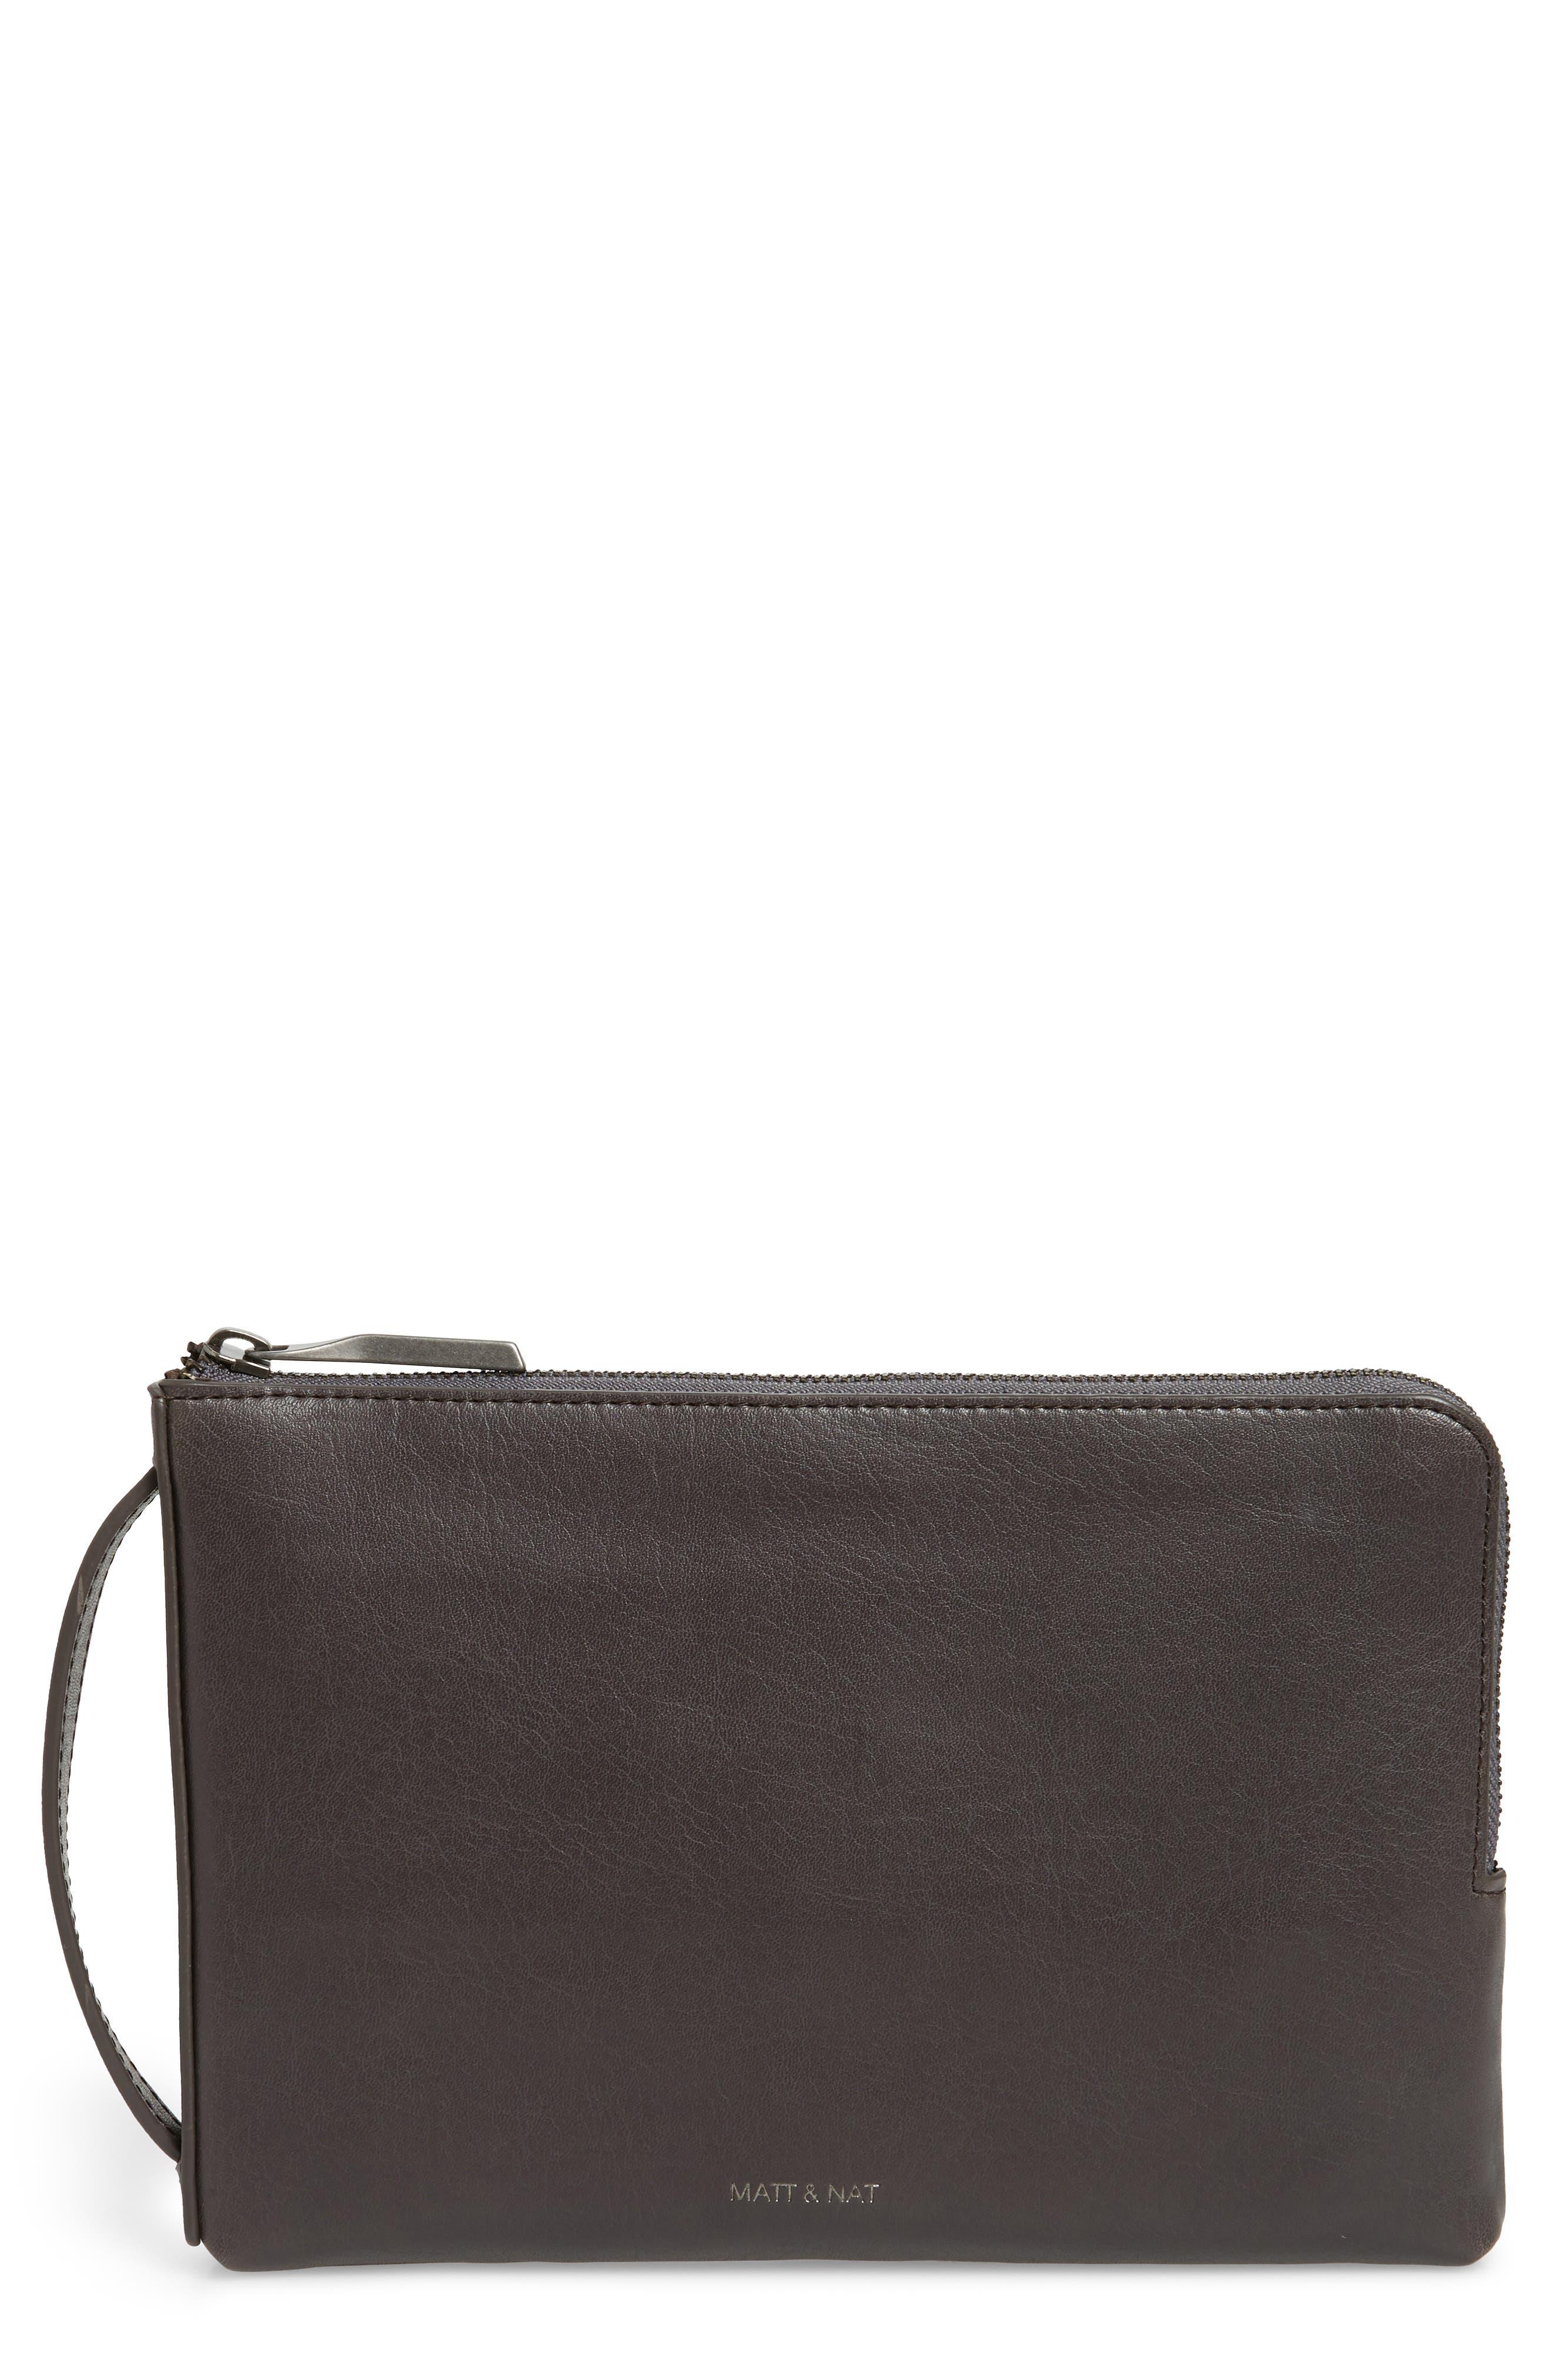 Matt & Nat Large Seva Faux Leather Pouch Wallet - Grey